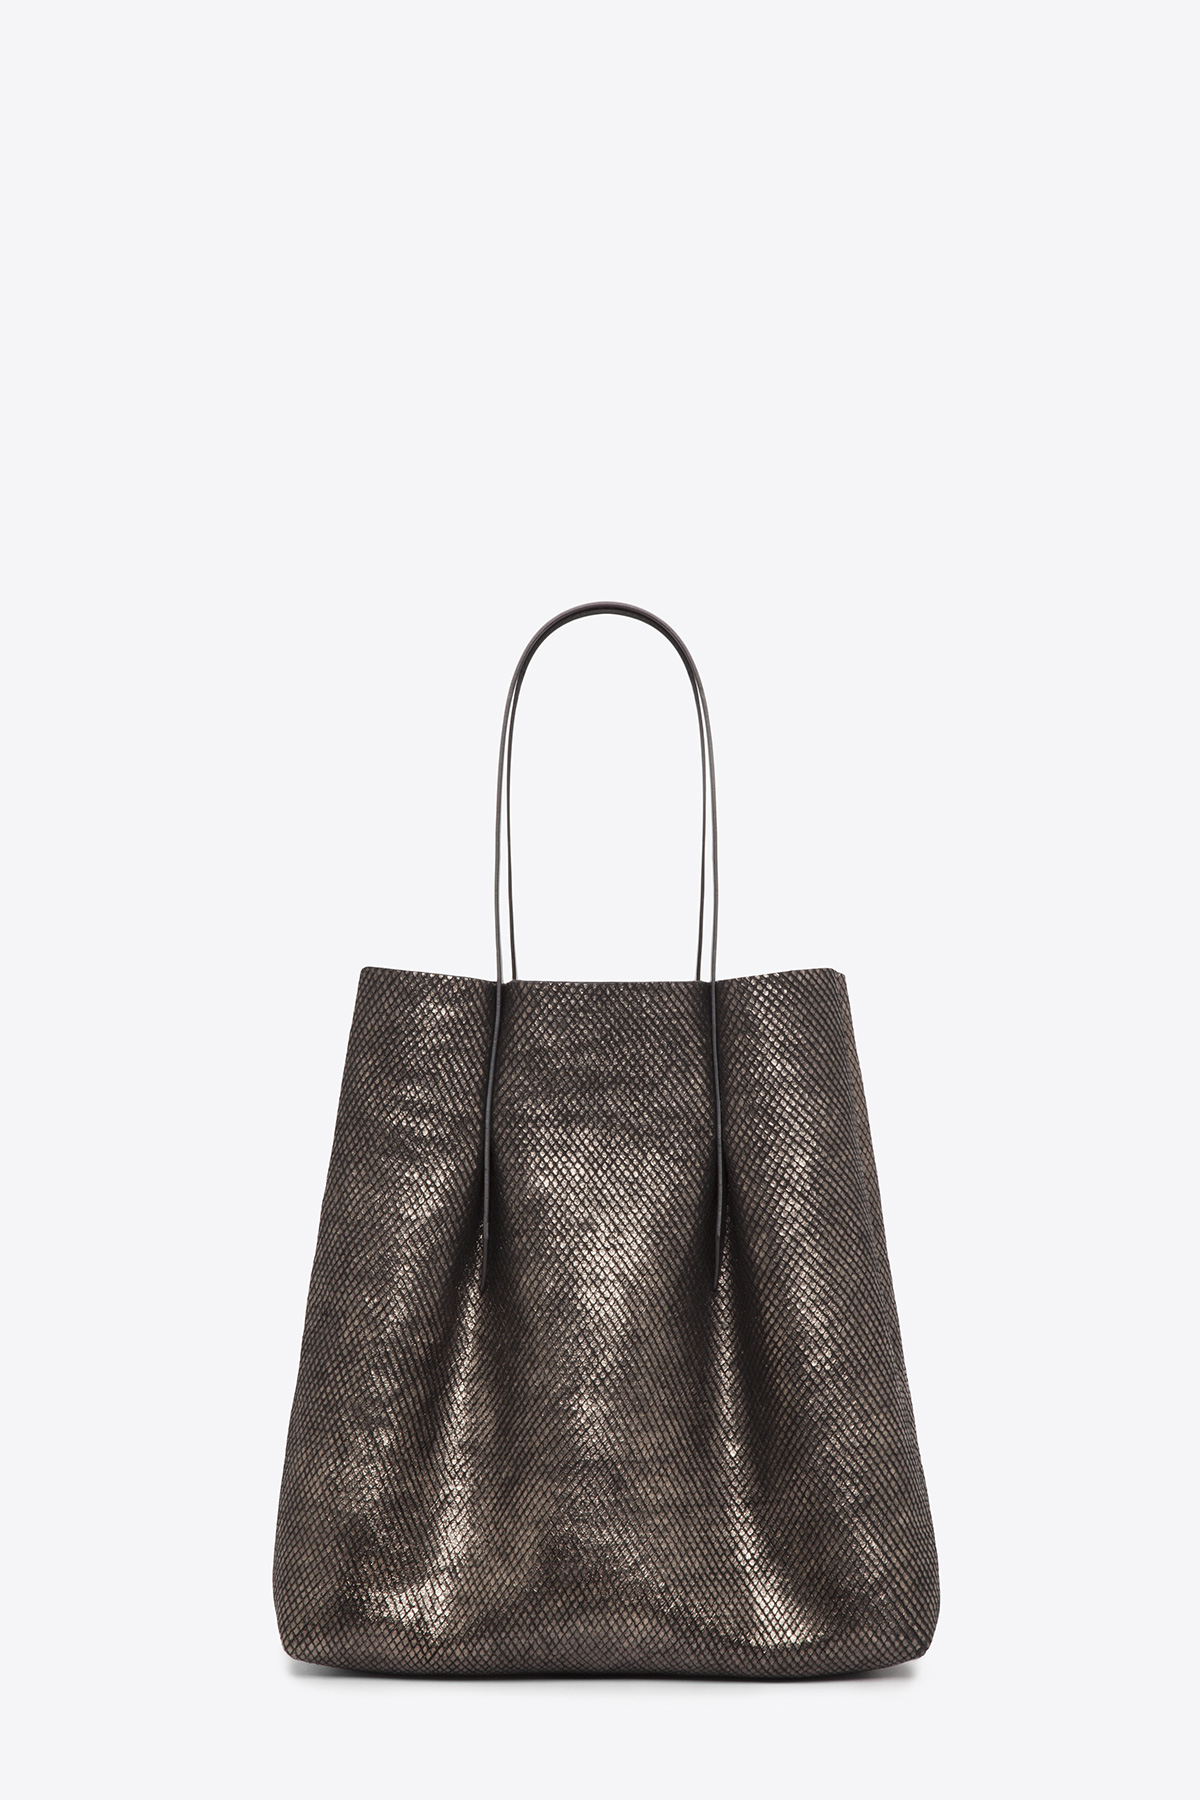 dclr006-shoppingbag-a24-backsnakebronze-back